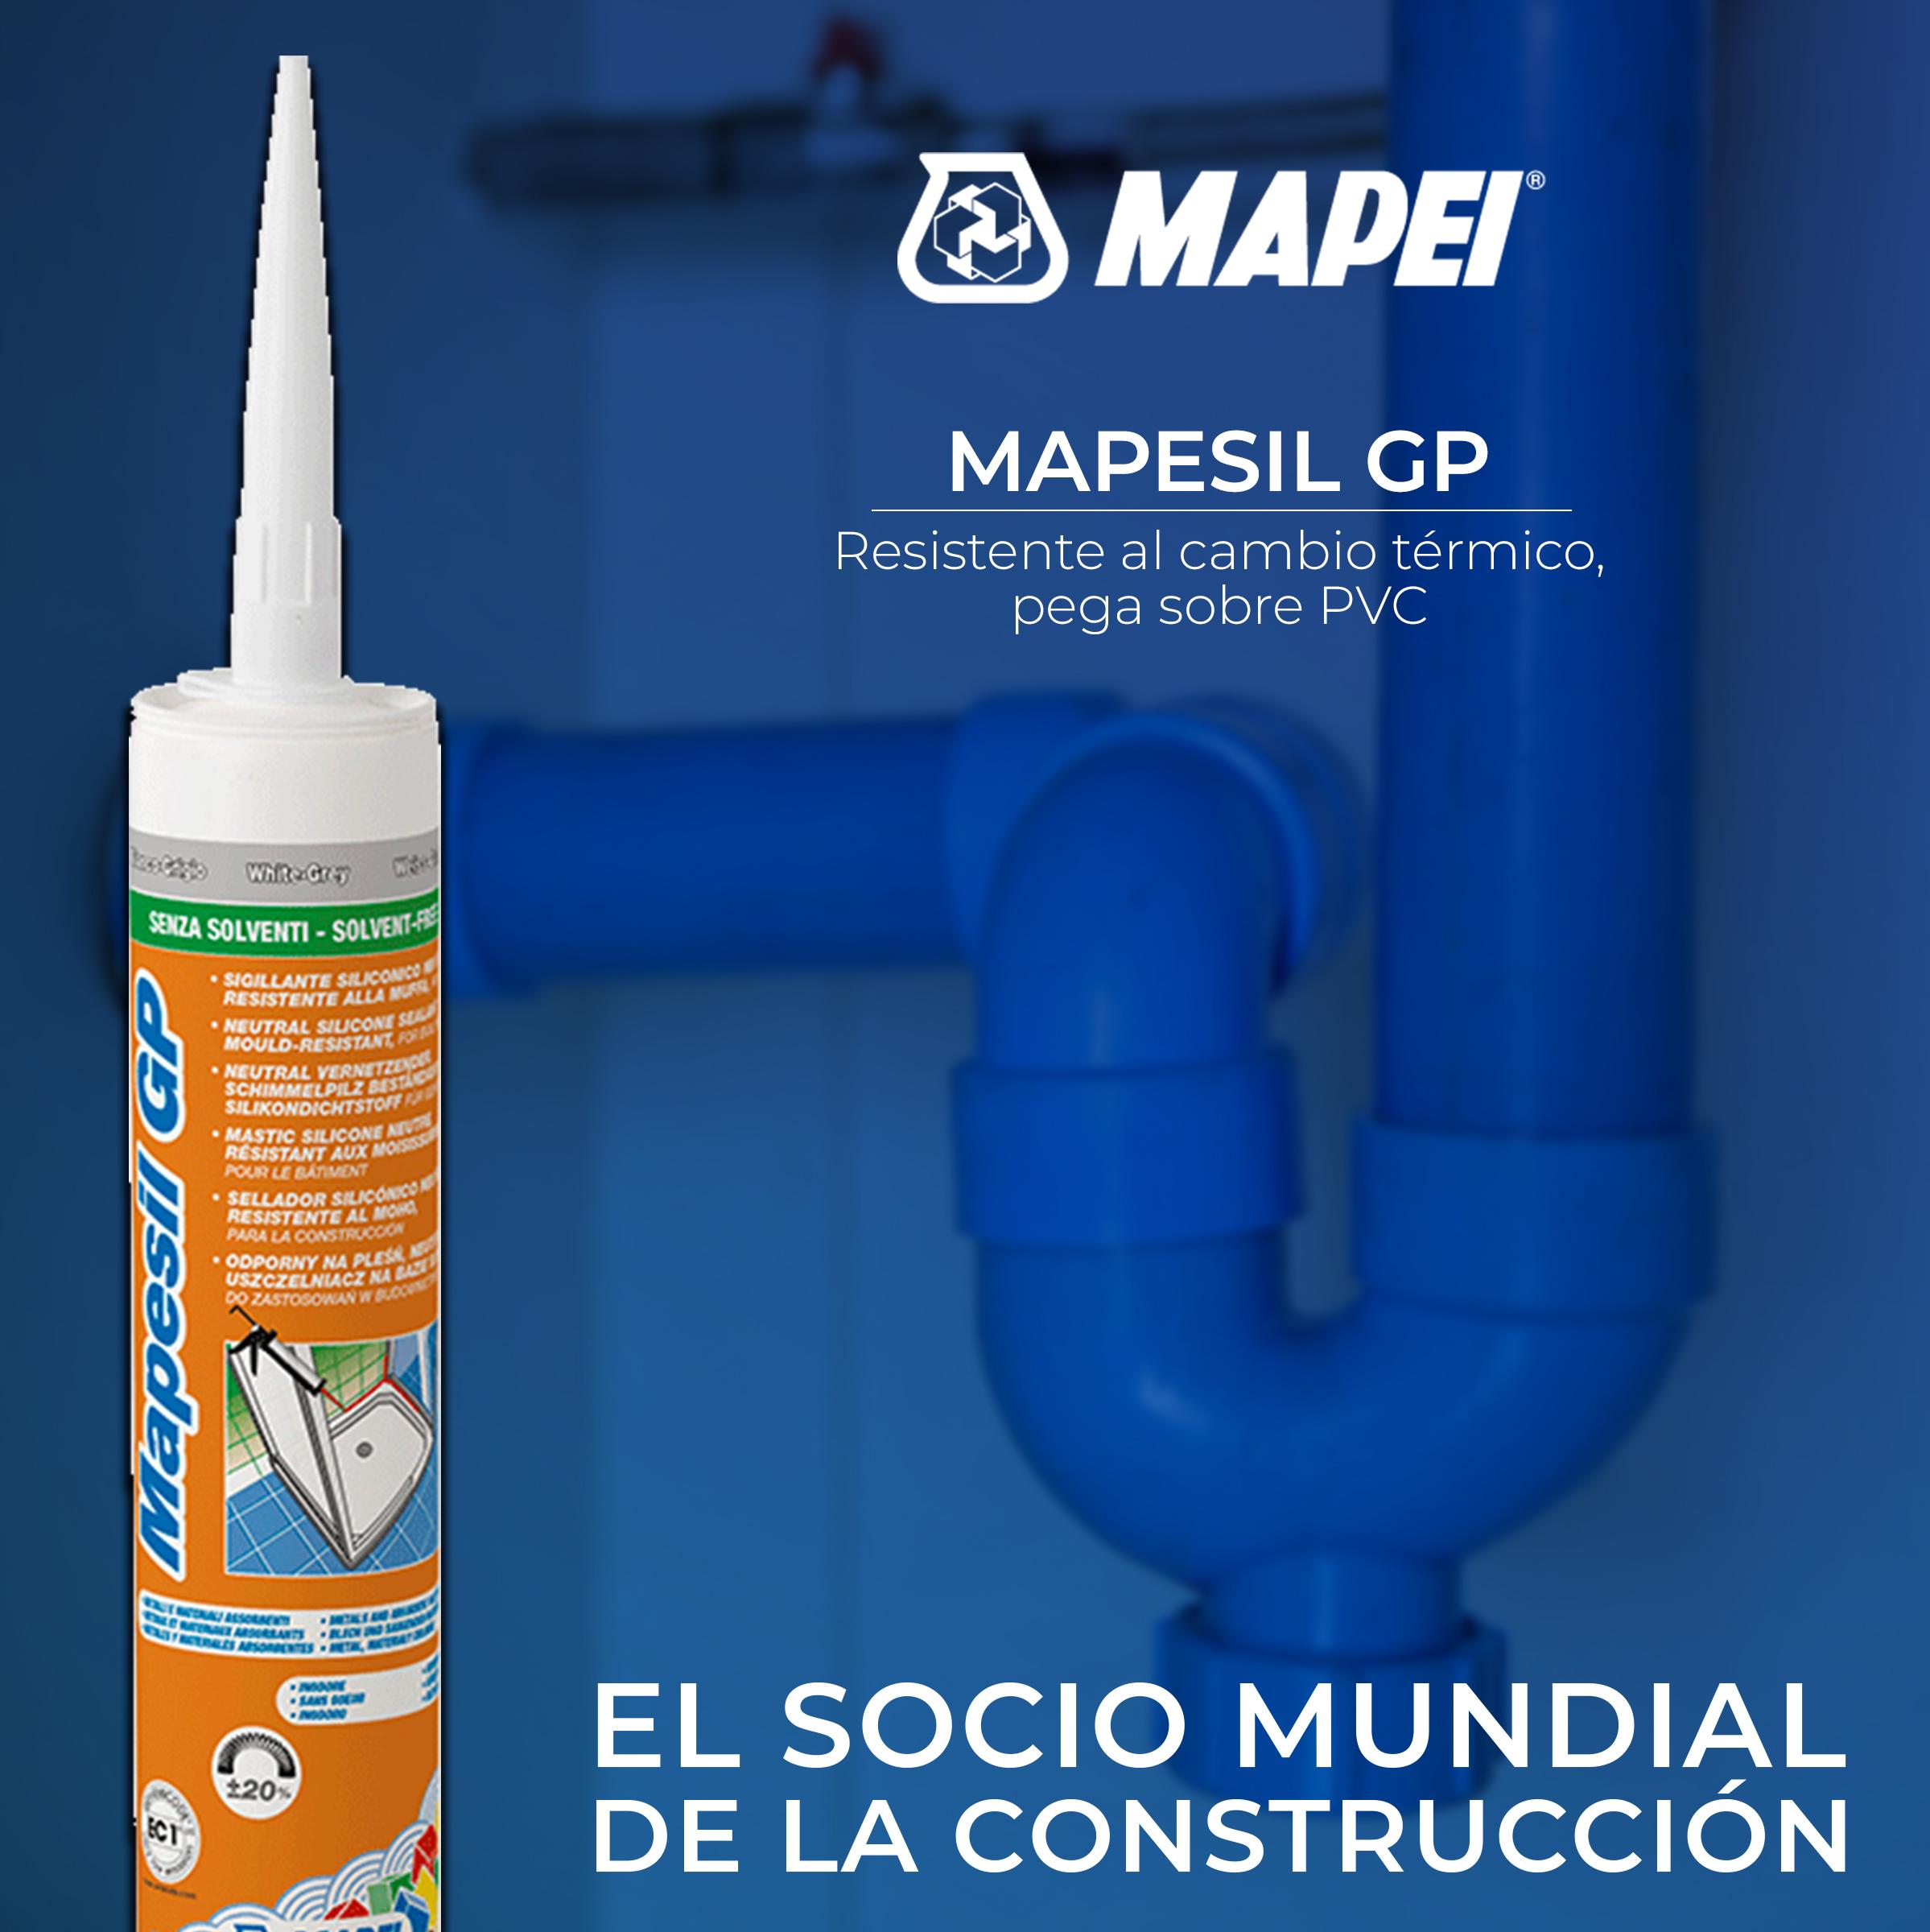 Mapesil GP